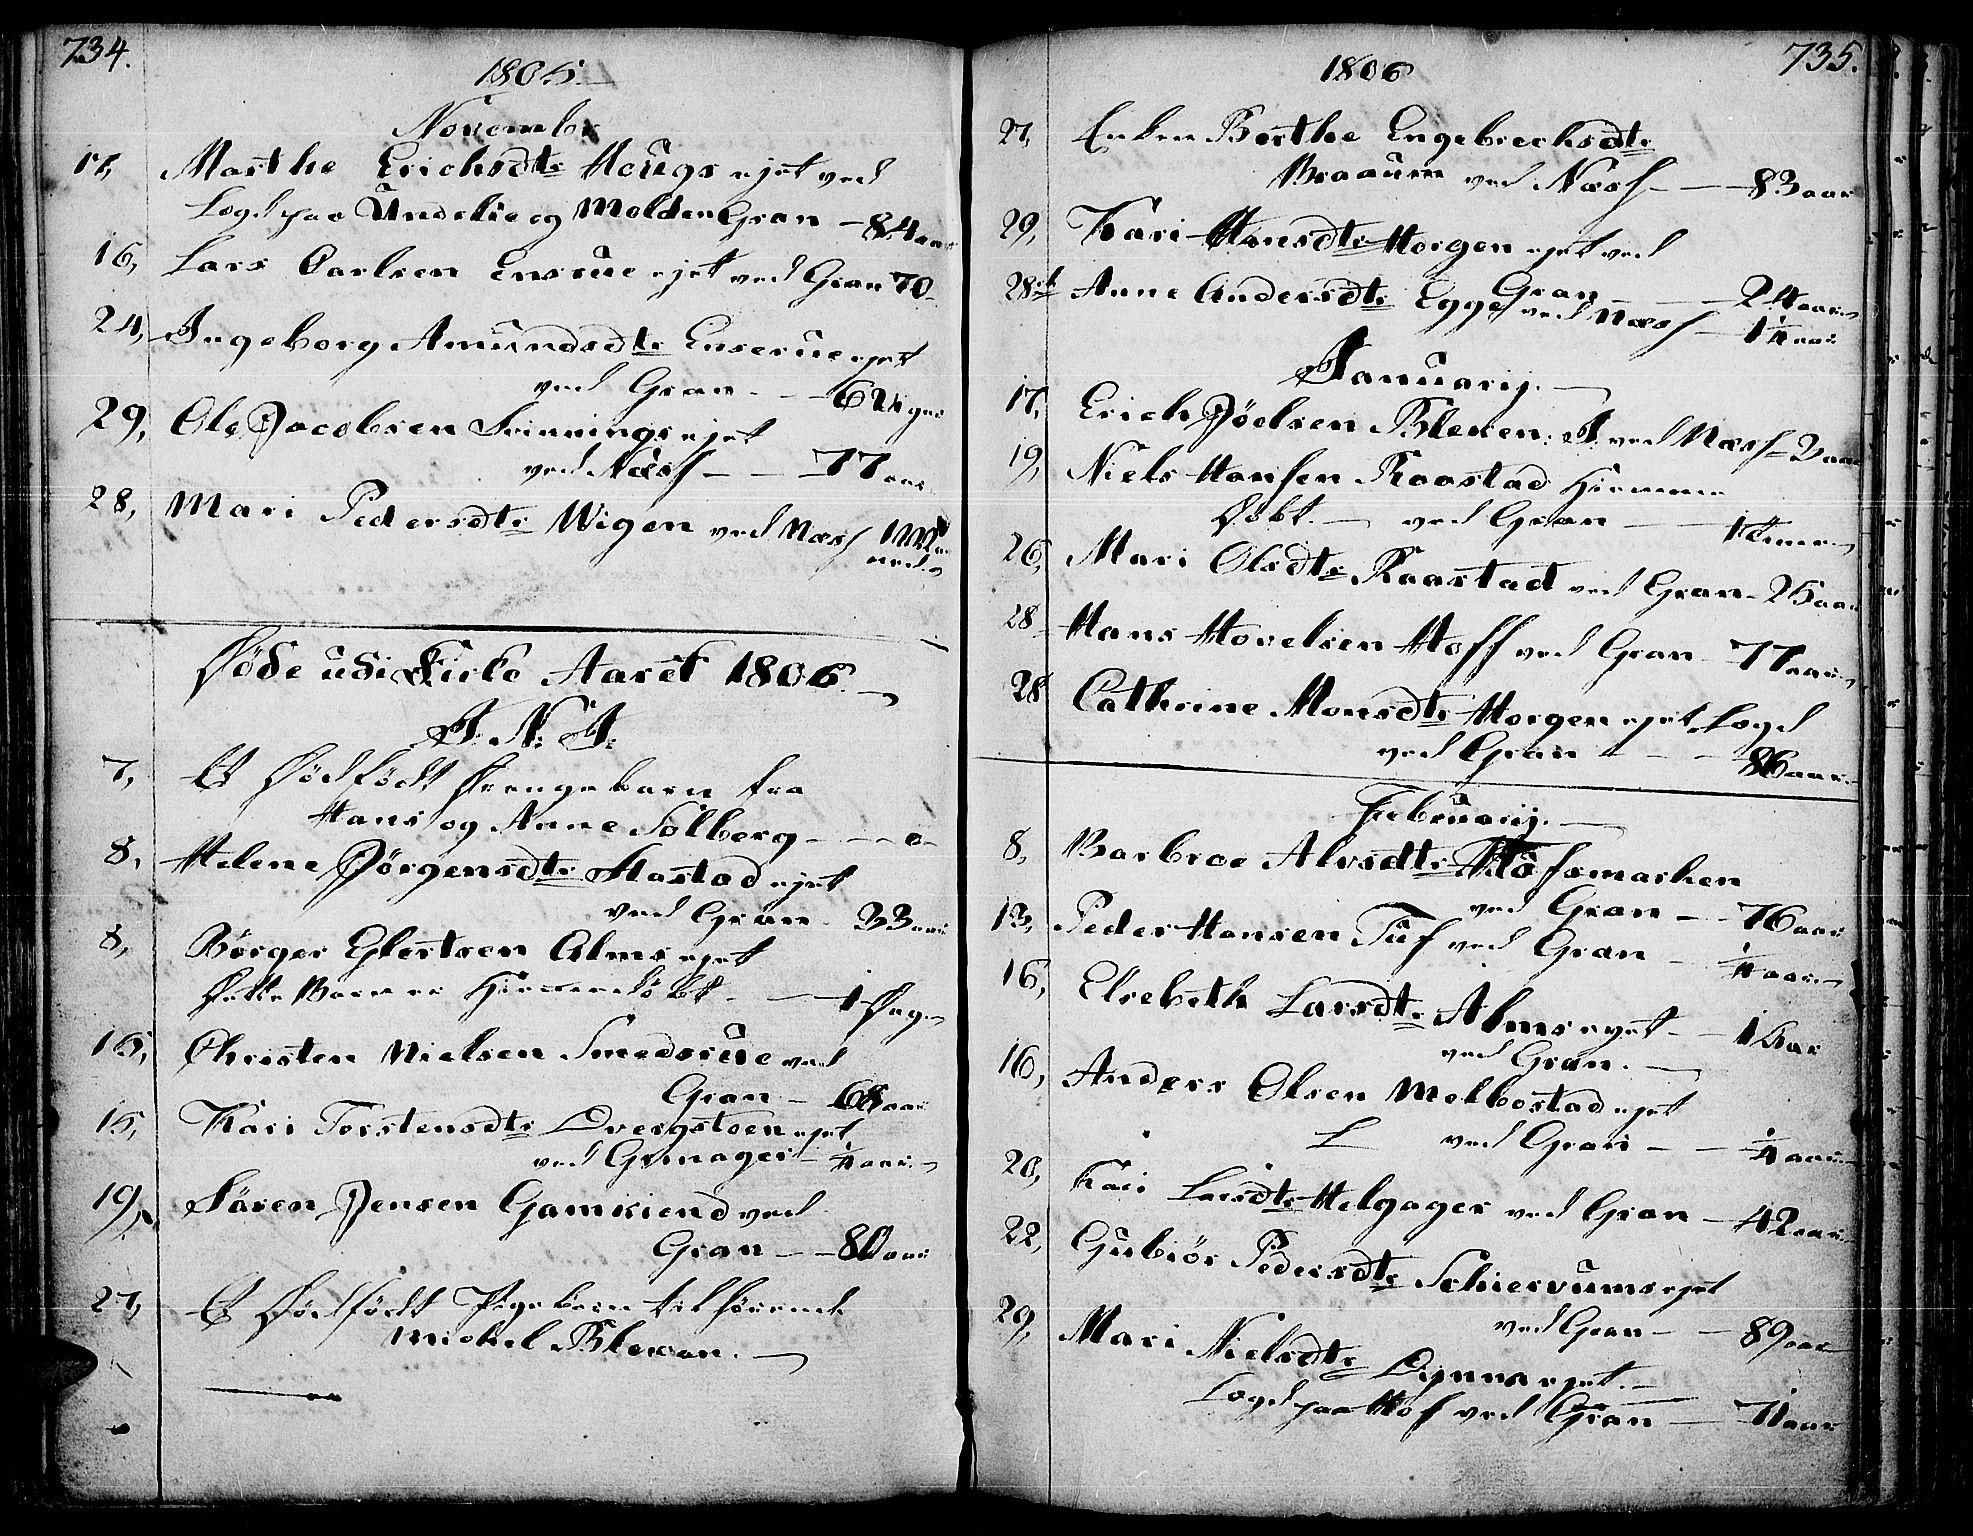 SAH, Gran prestekontor, Ministerialbok nr. 6, 1787-1824, s. 734-735